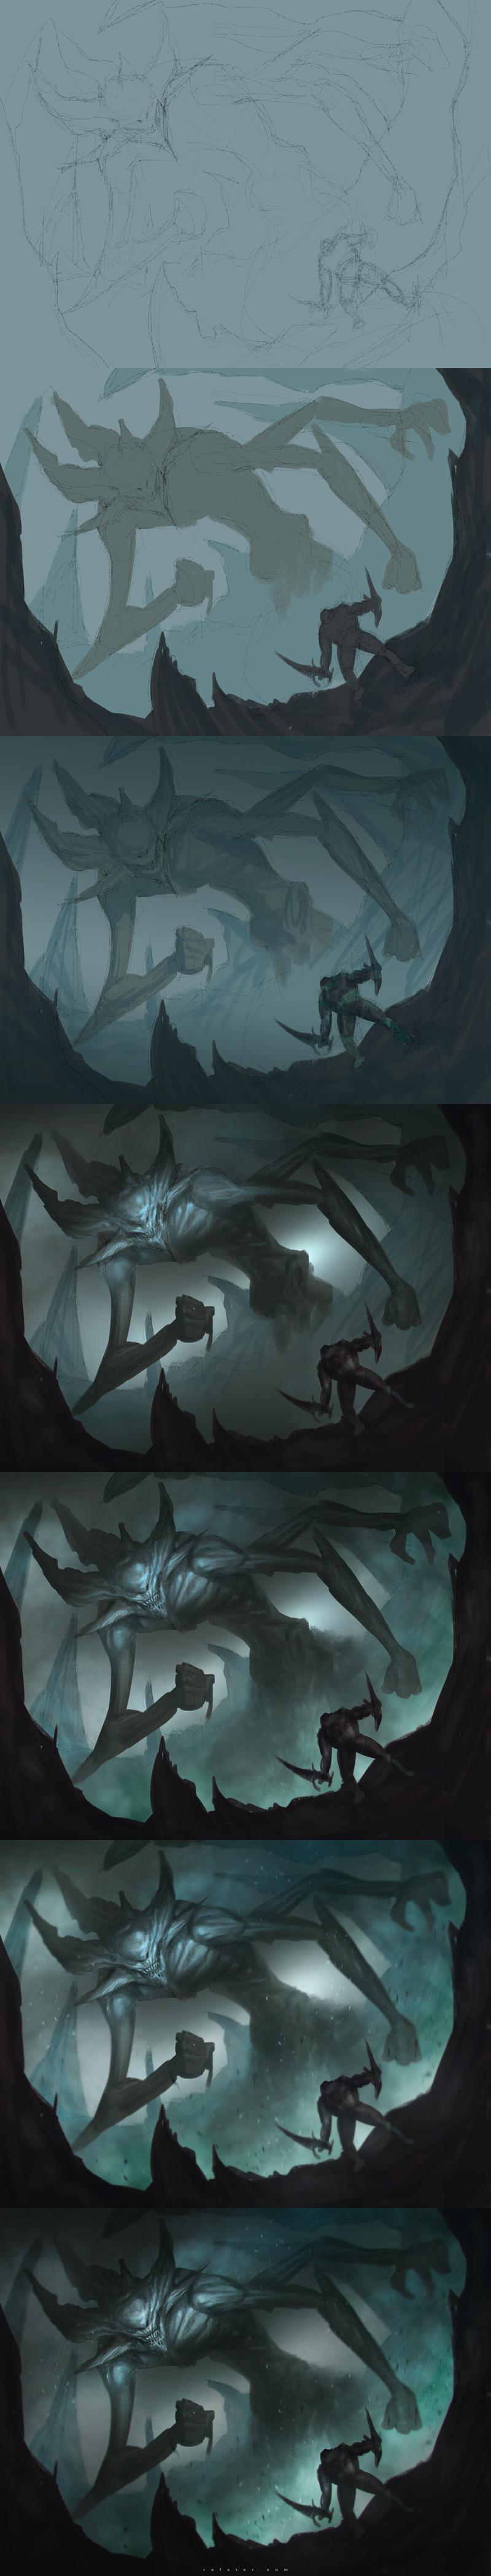 Speedpainting: Fog demon step by step by rafater